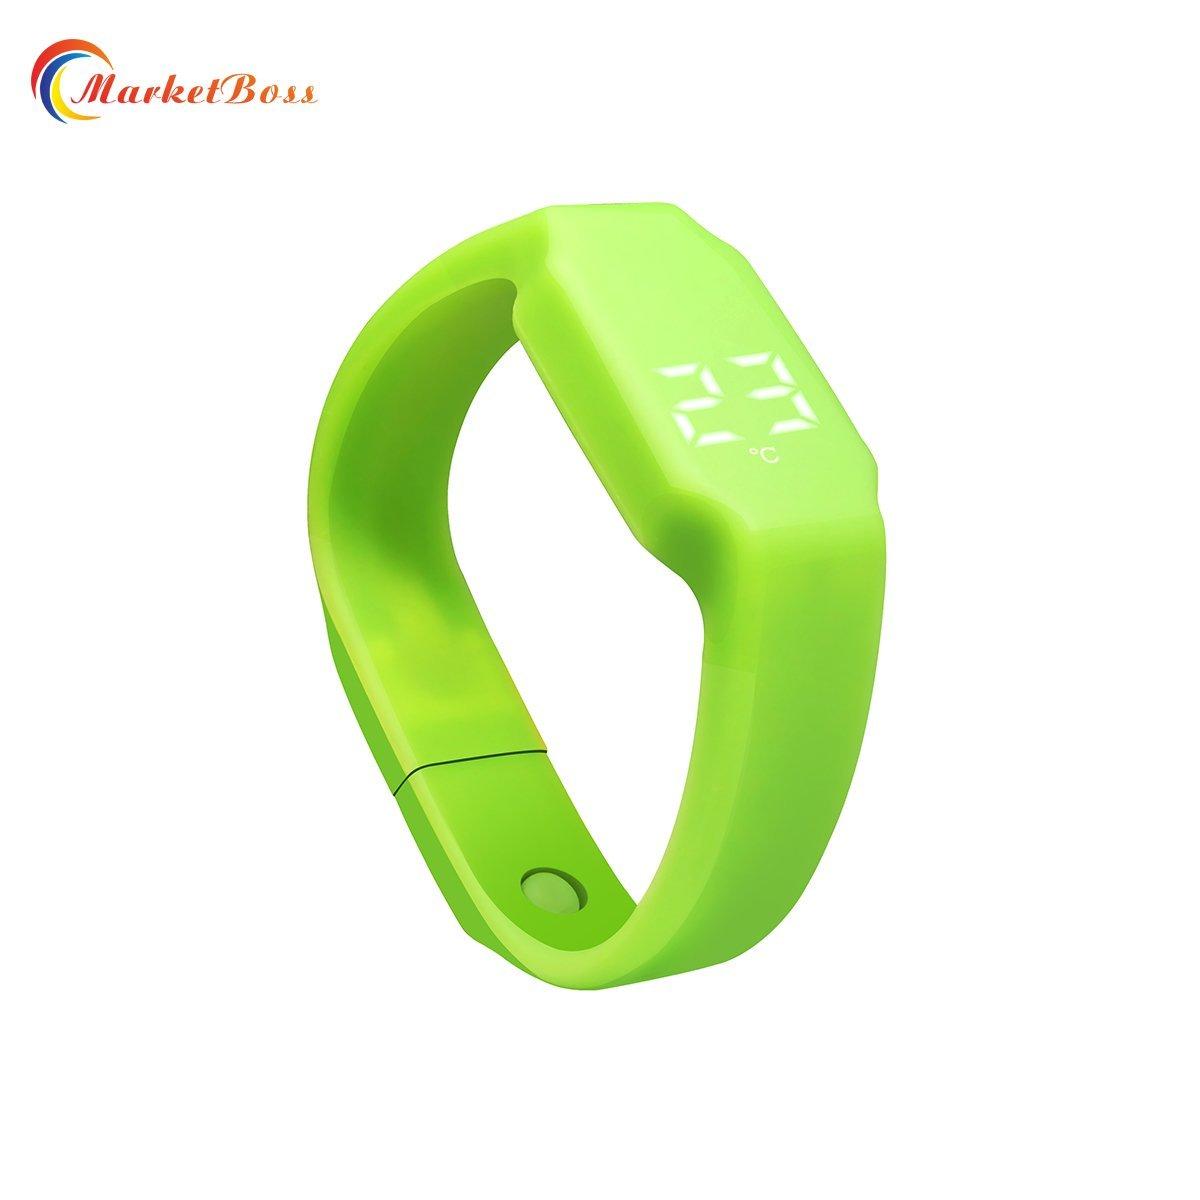 MarketBoss Cool Wrist Watch Support muilti-language 3D Sensor Data Collector/Time/Week/Temperature Display /pedometer/Calorie Counter/Sleep Monitor USB Port(green)